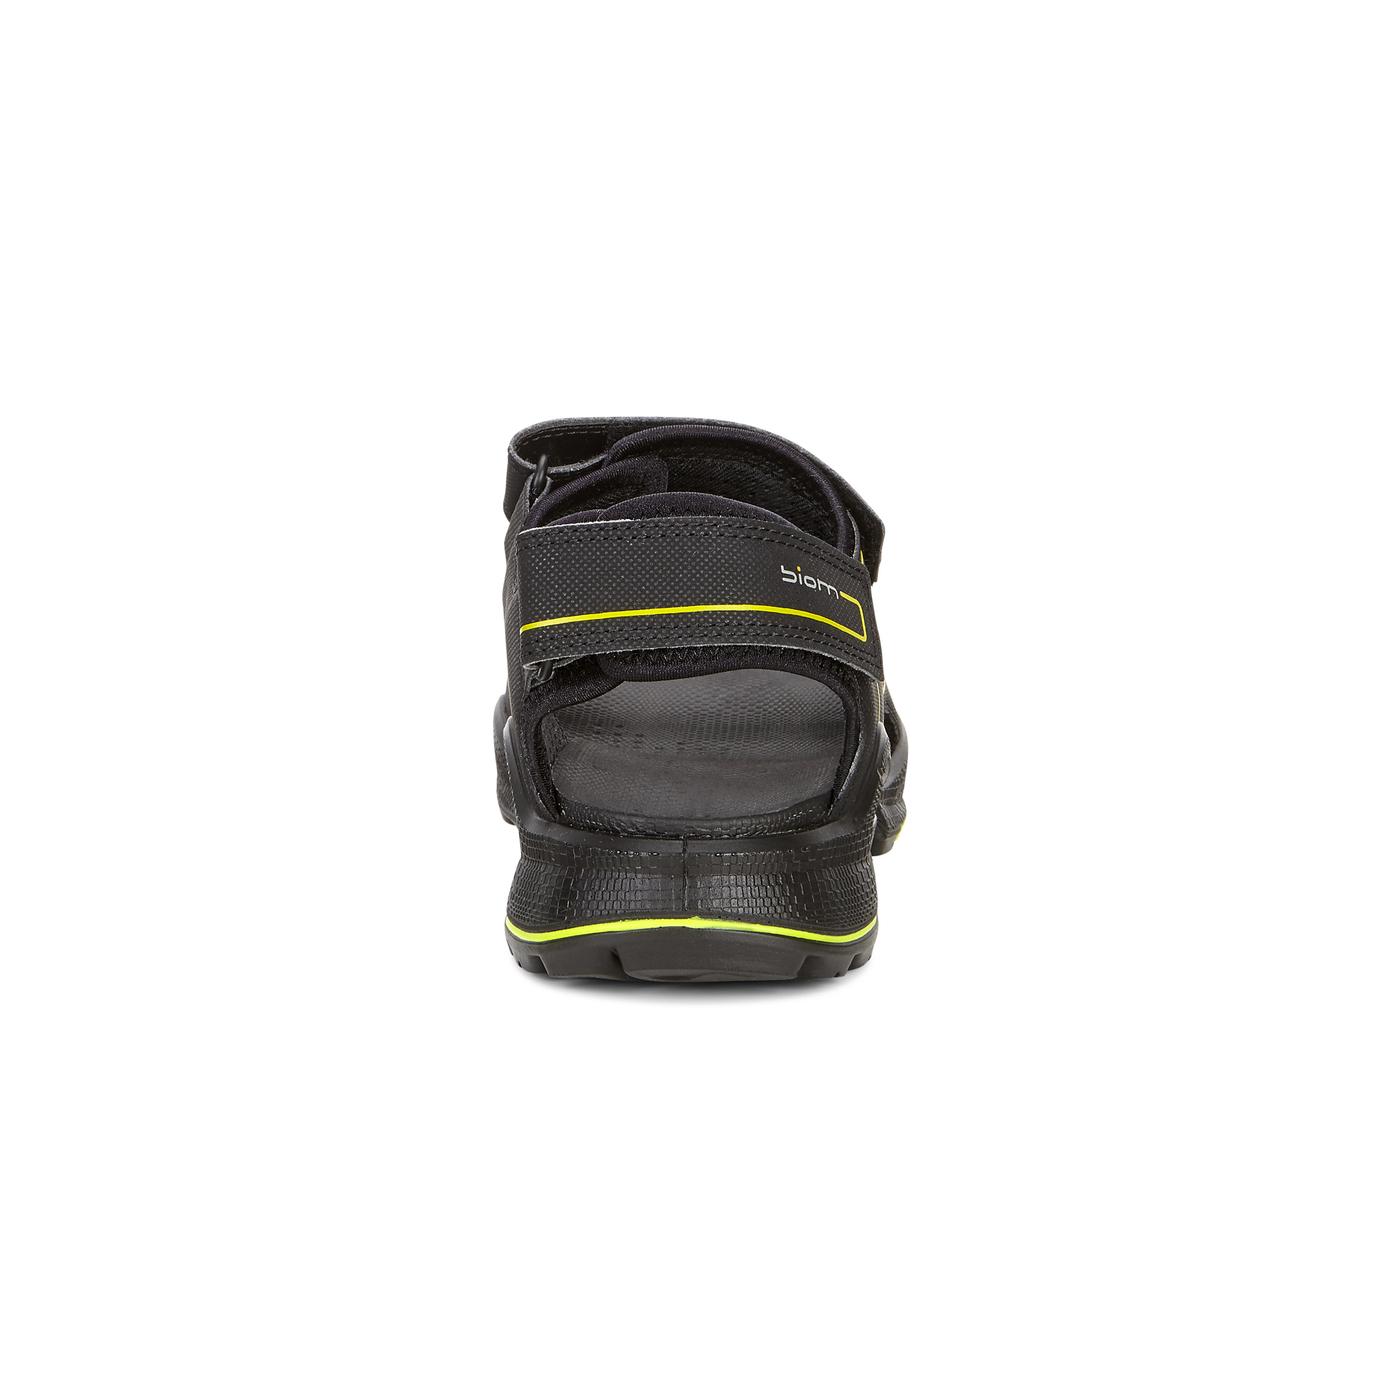 ECCO BIOM SANDAL Flat Sandal